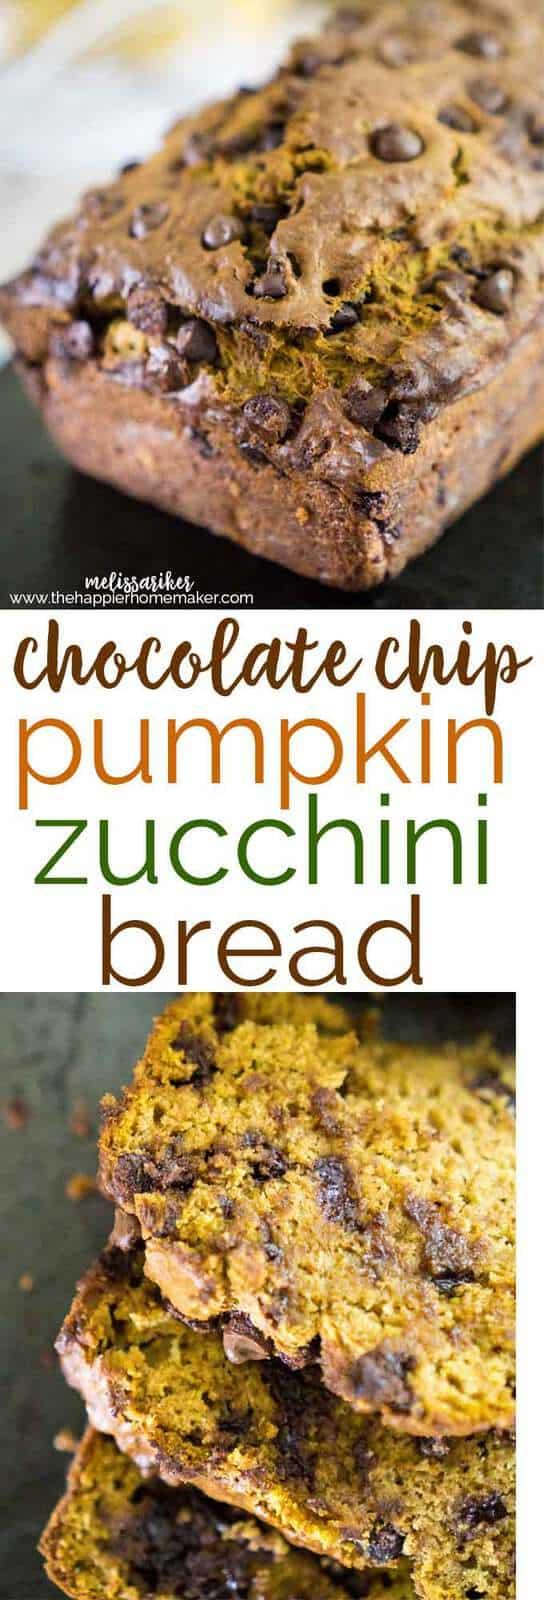 Moist, delicious Chocolate Chip Pumpkin Zucchini Bread recipe that's perfect for fall.